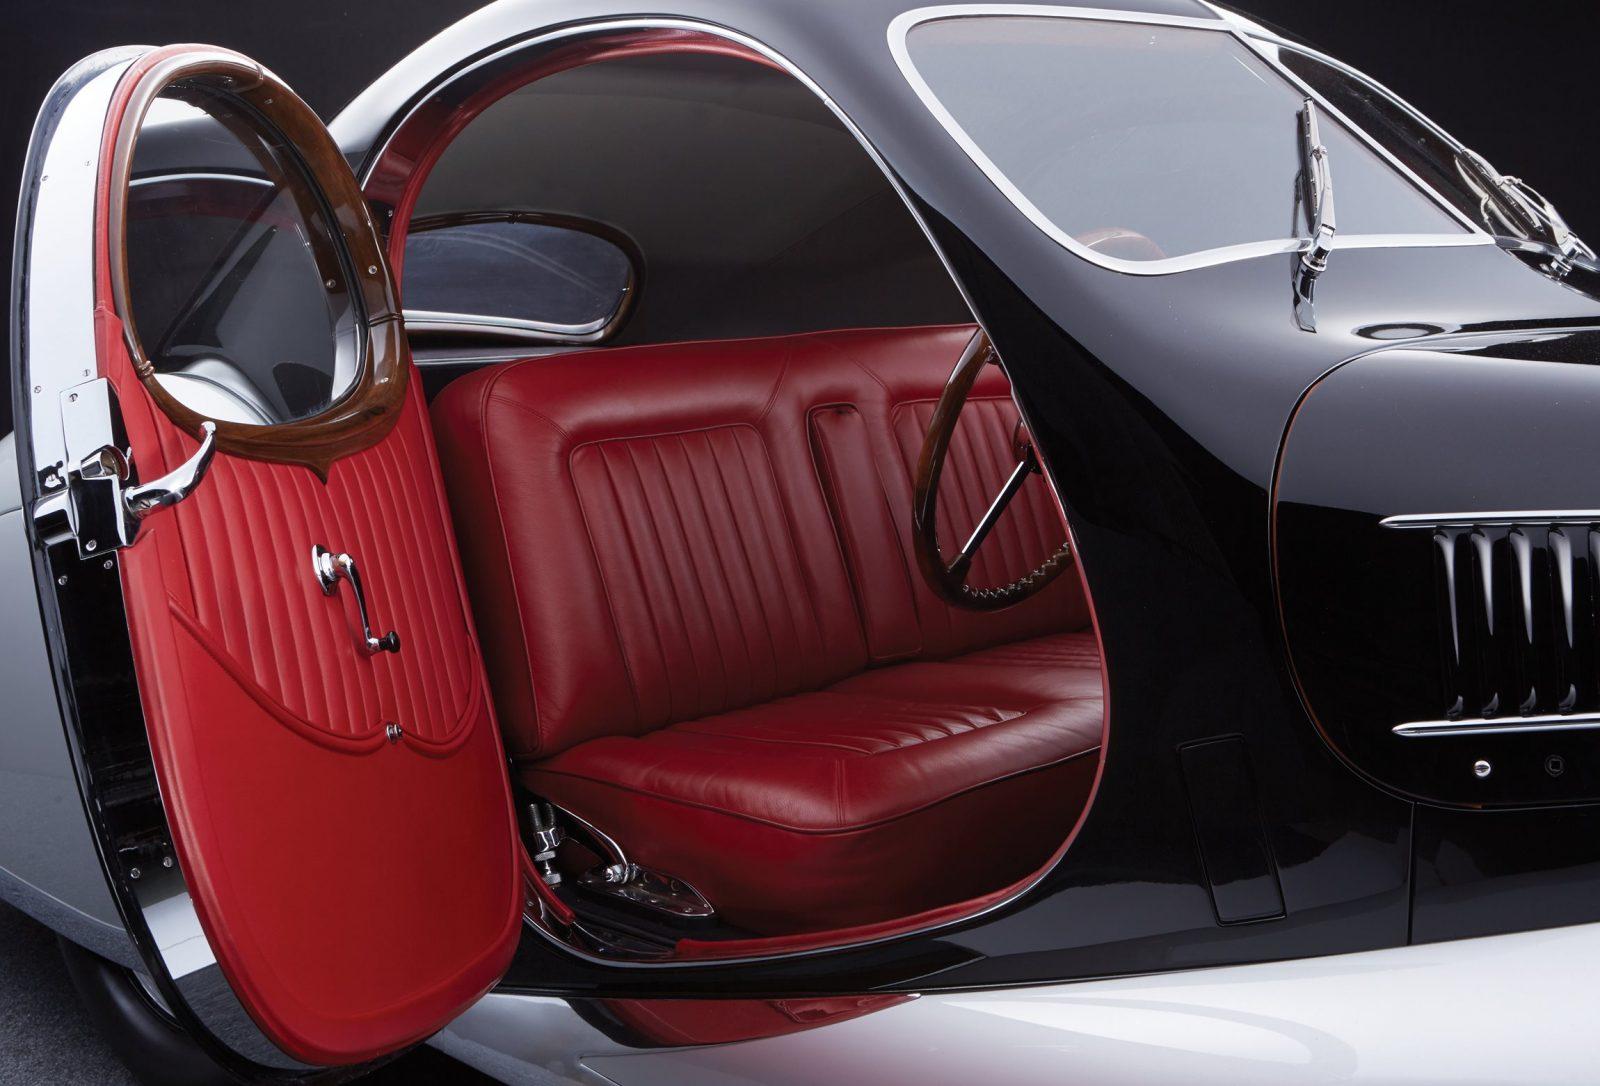 1937 Talbot-Lago T150-C SS 11